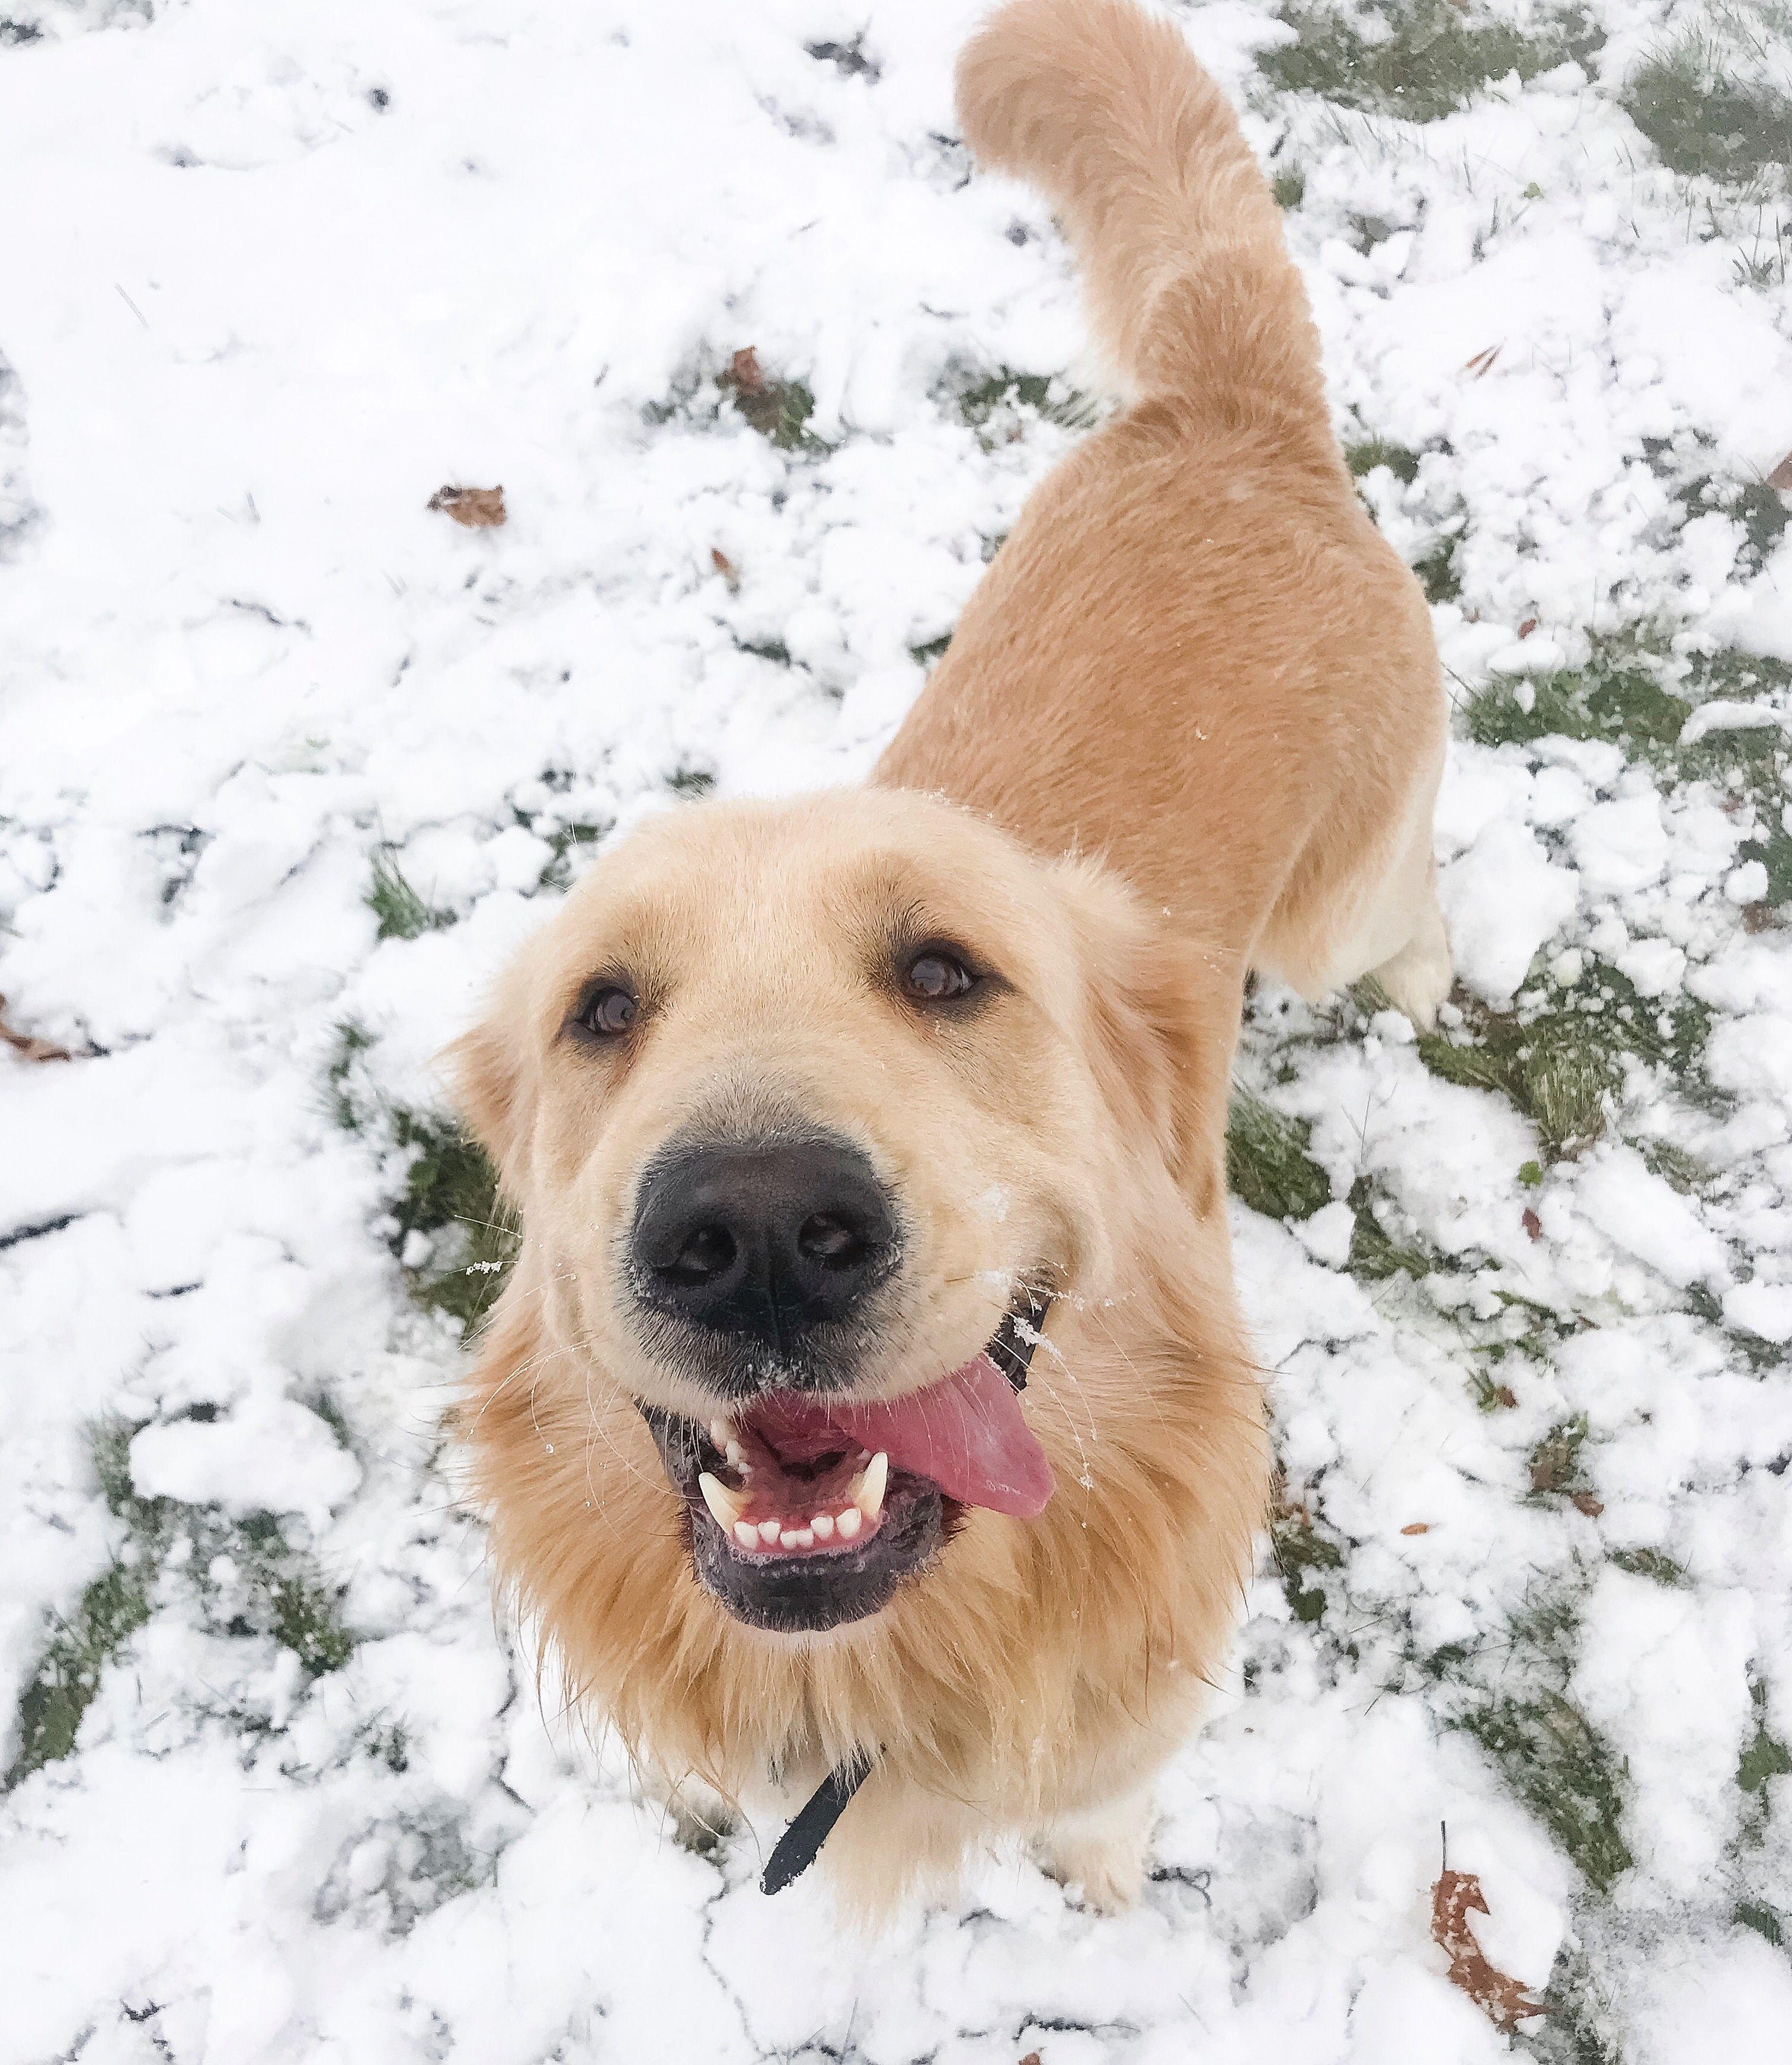 Golden Retriever Joyful Jax From Maine Showing Off His Best Smile